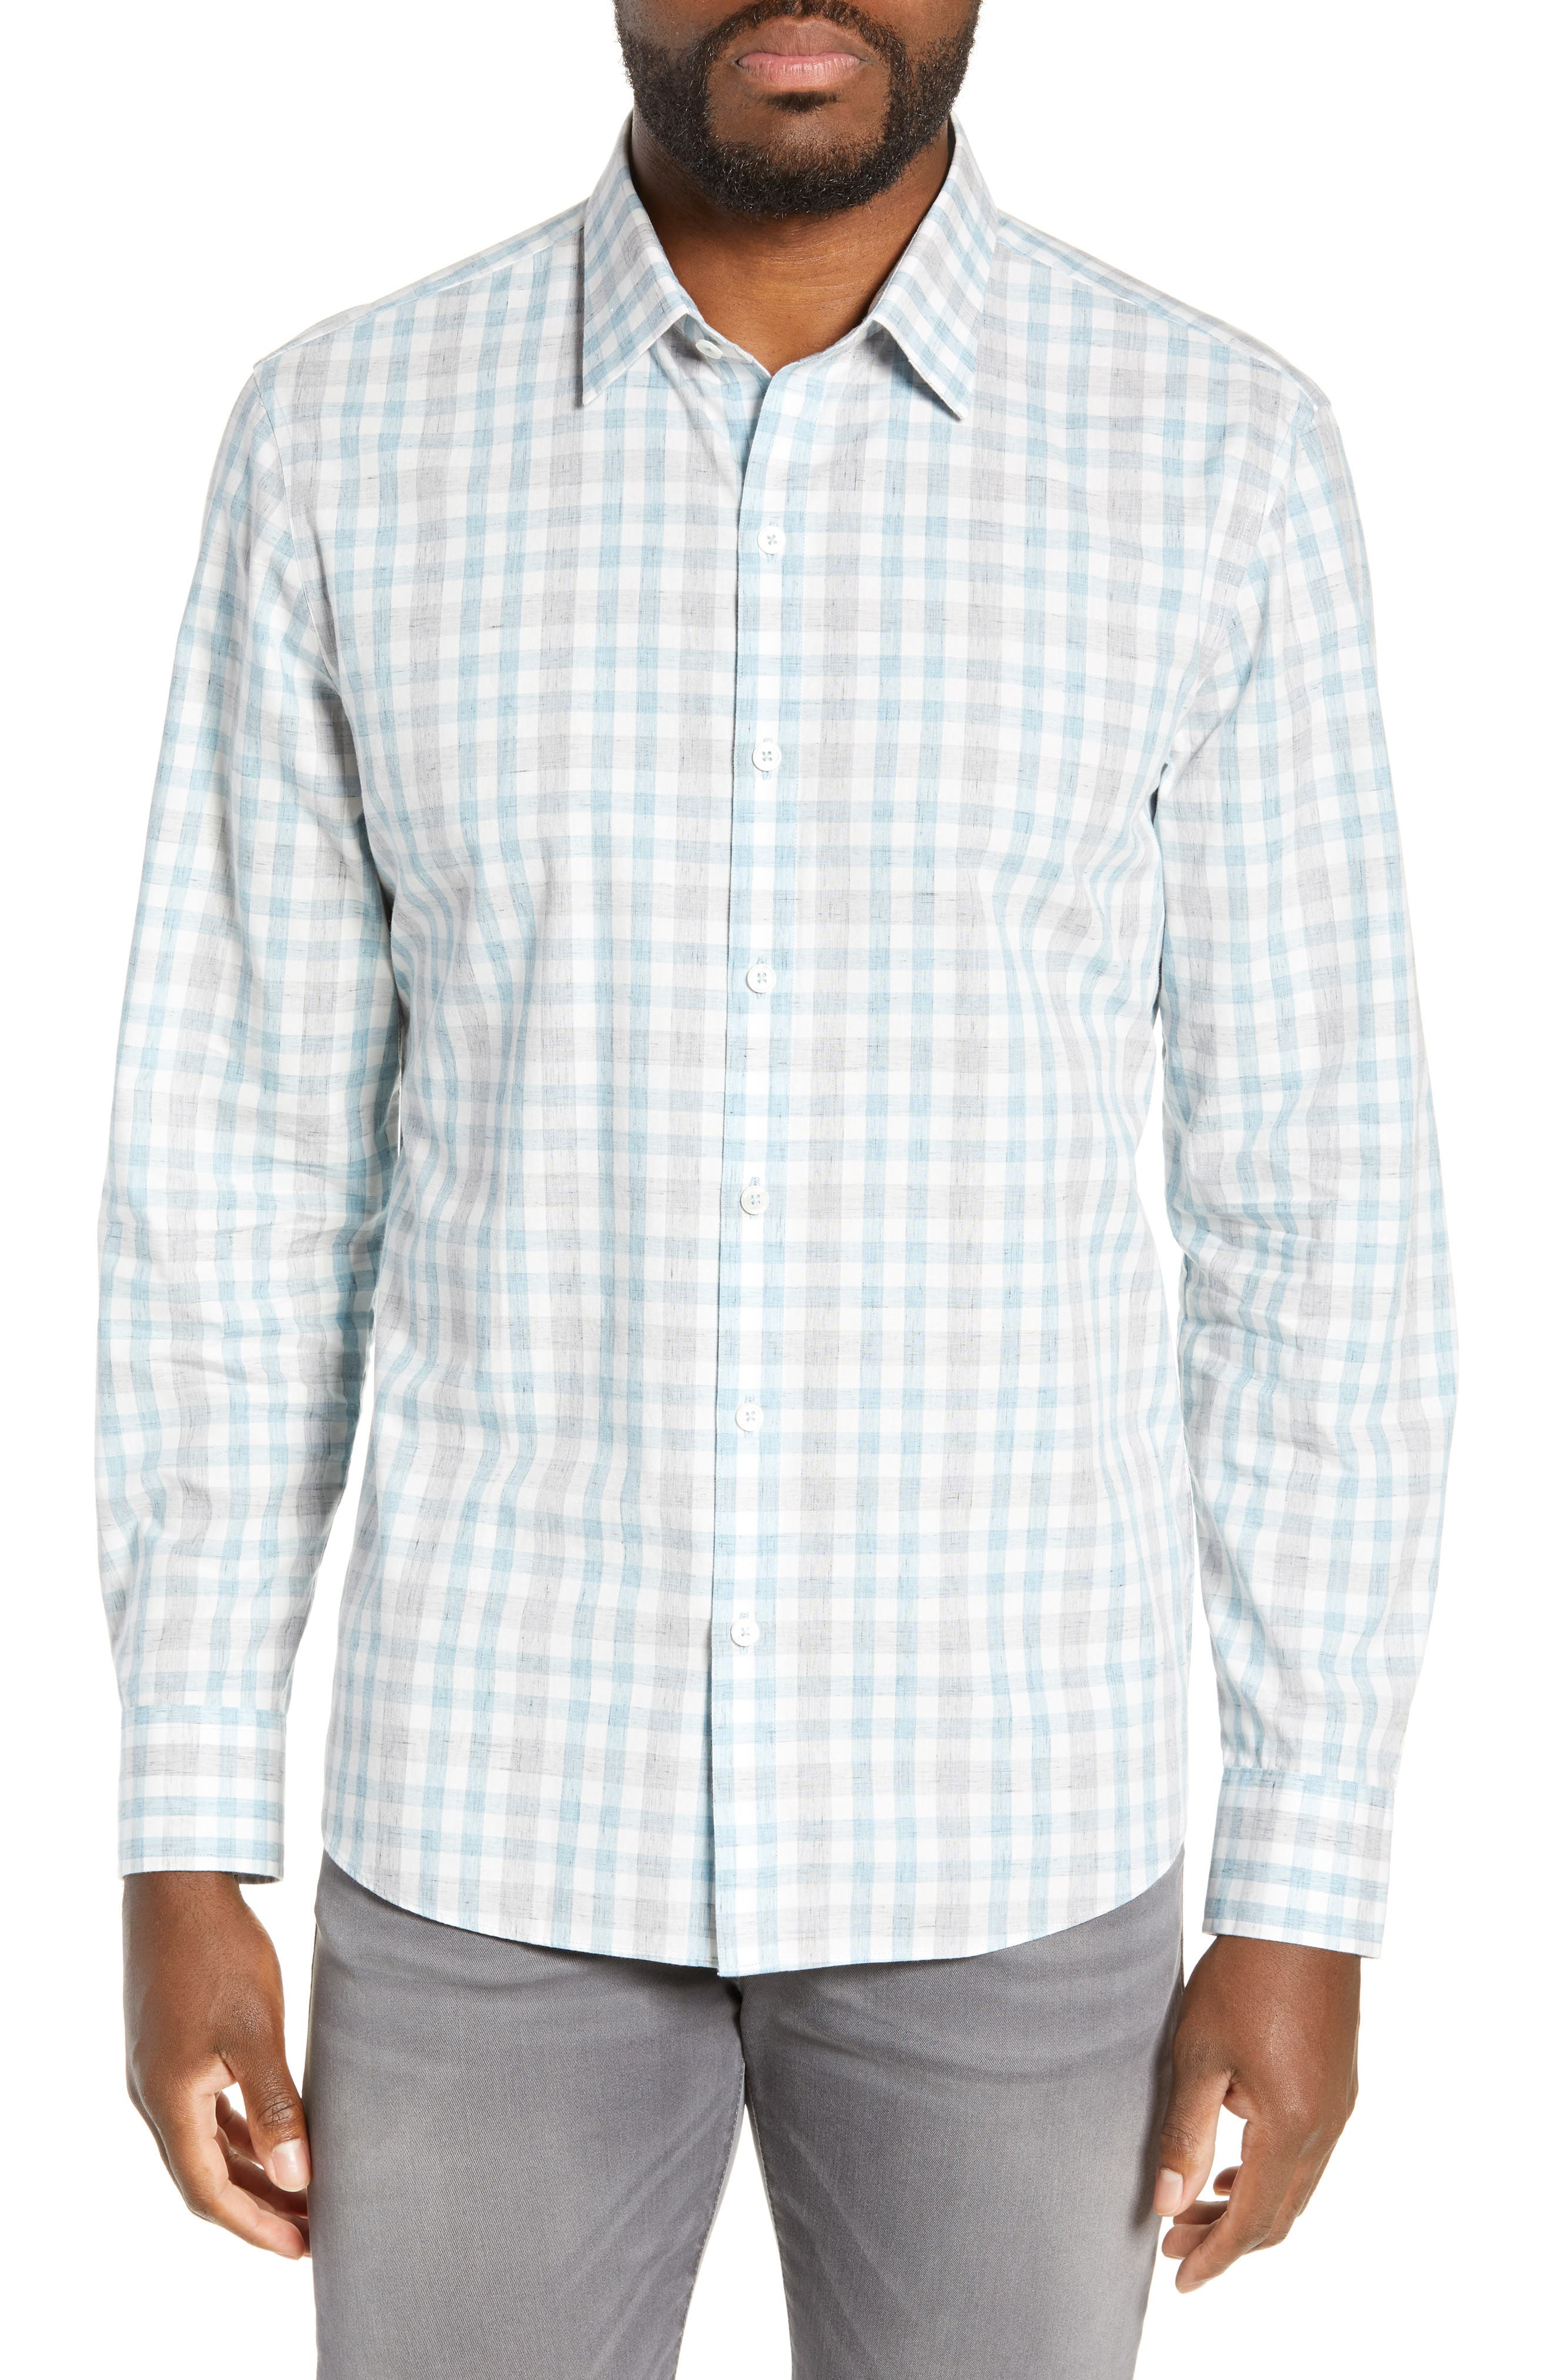 ZACHARY PRELL Regular Fit Plaid Sport Shirt, Main, color, LIGHT BLUE